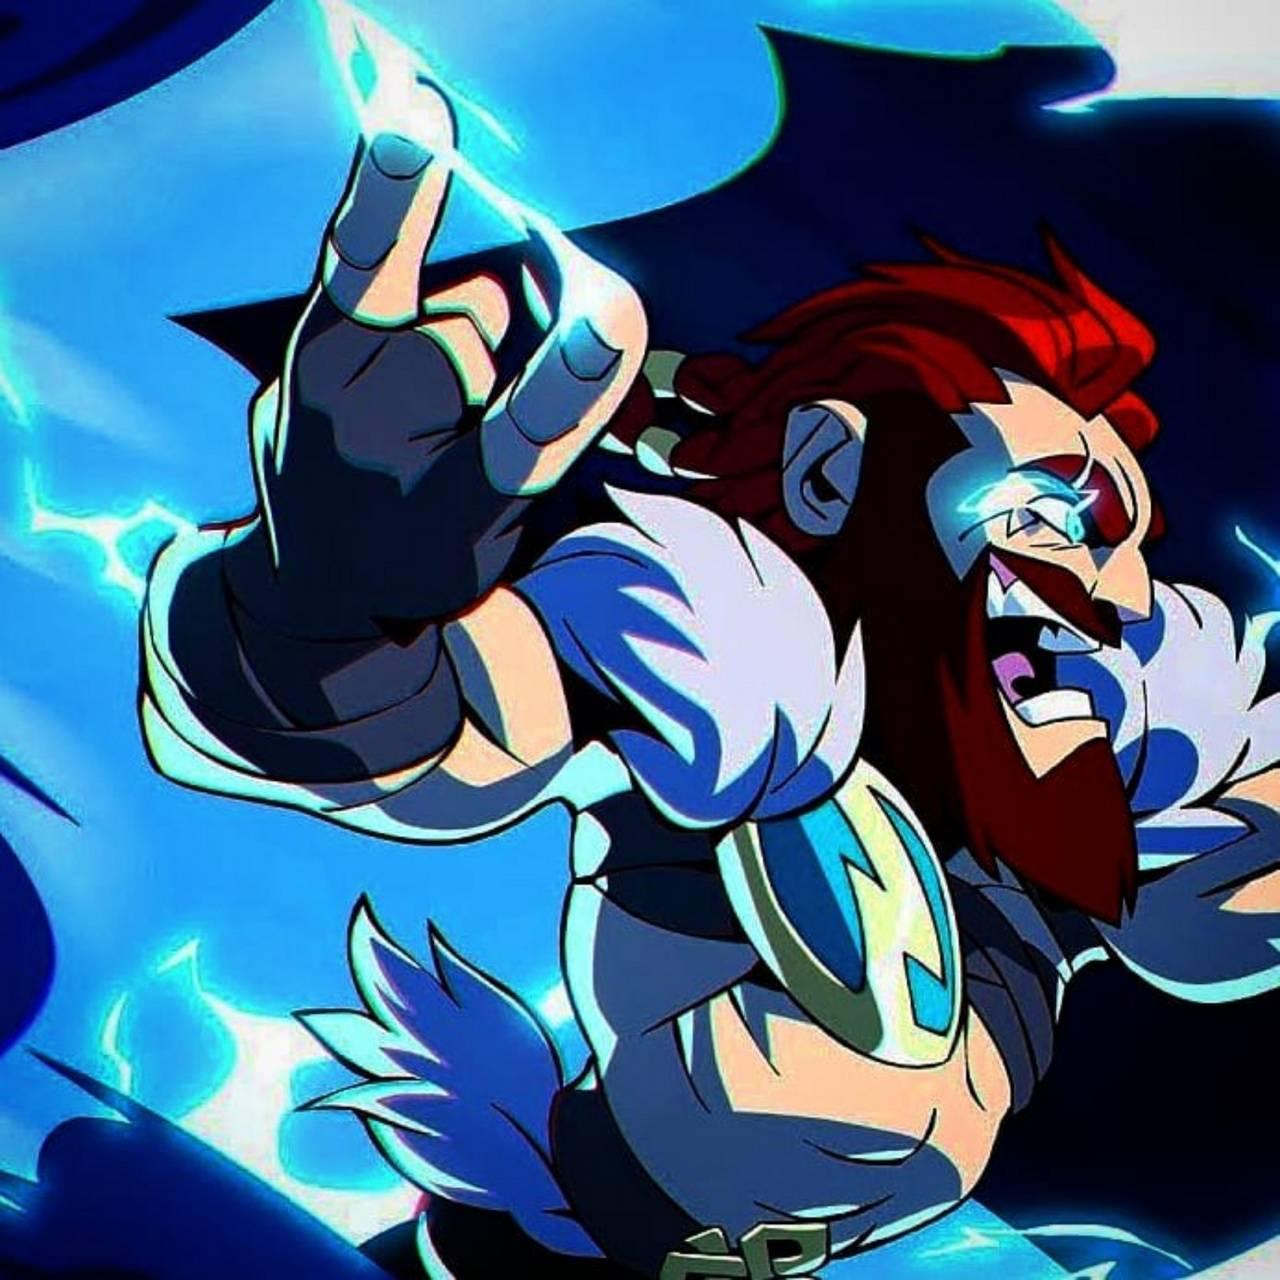 Thor BrawlHalla